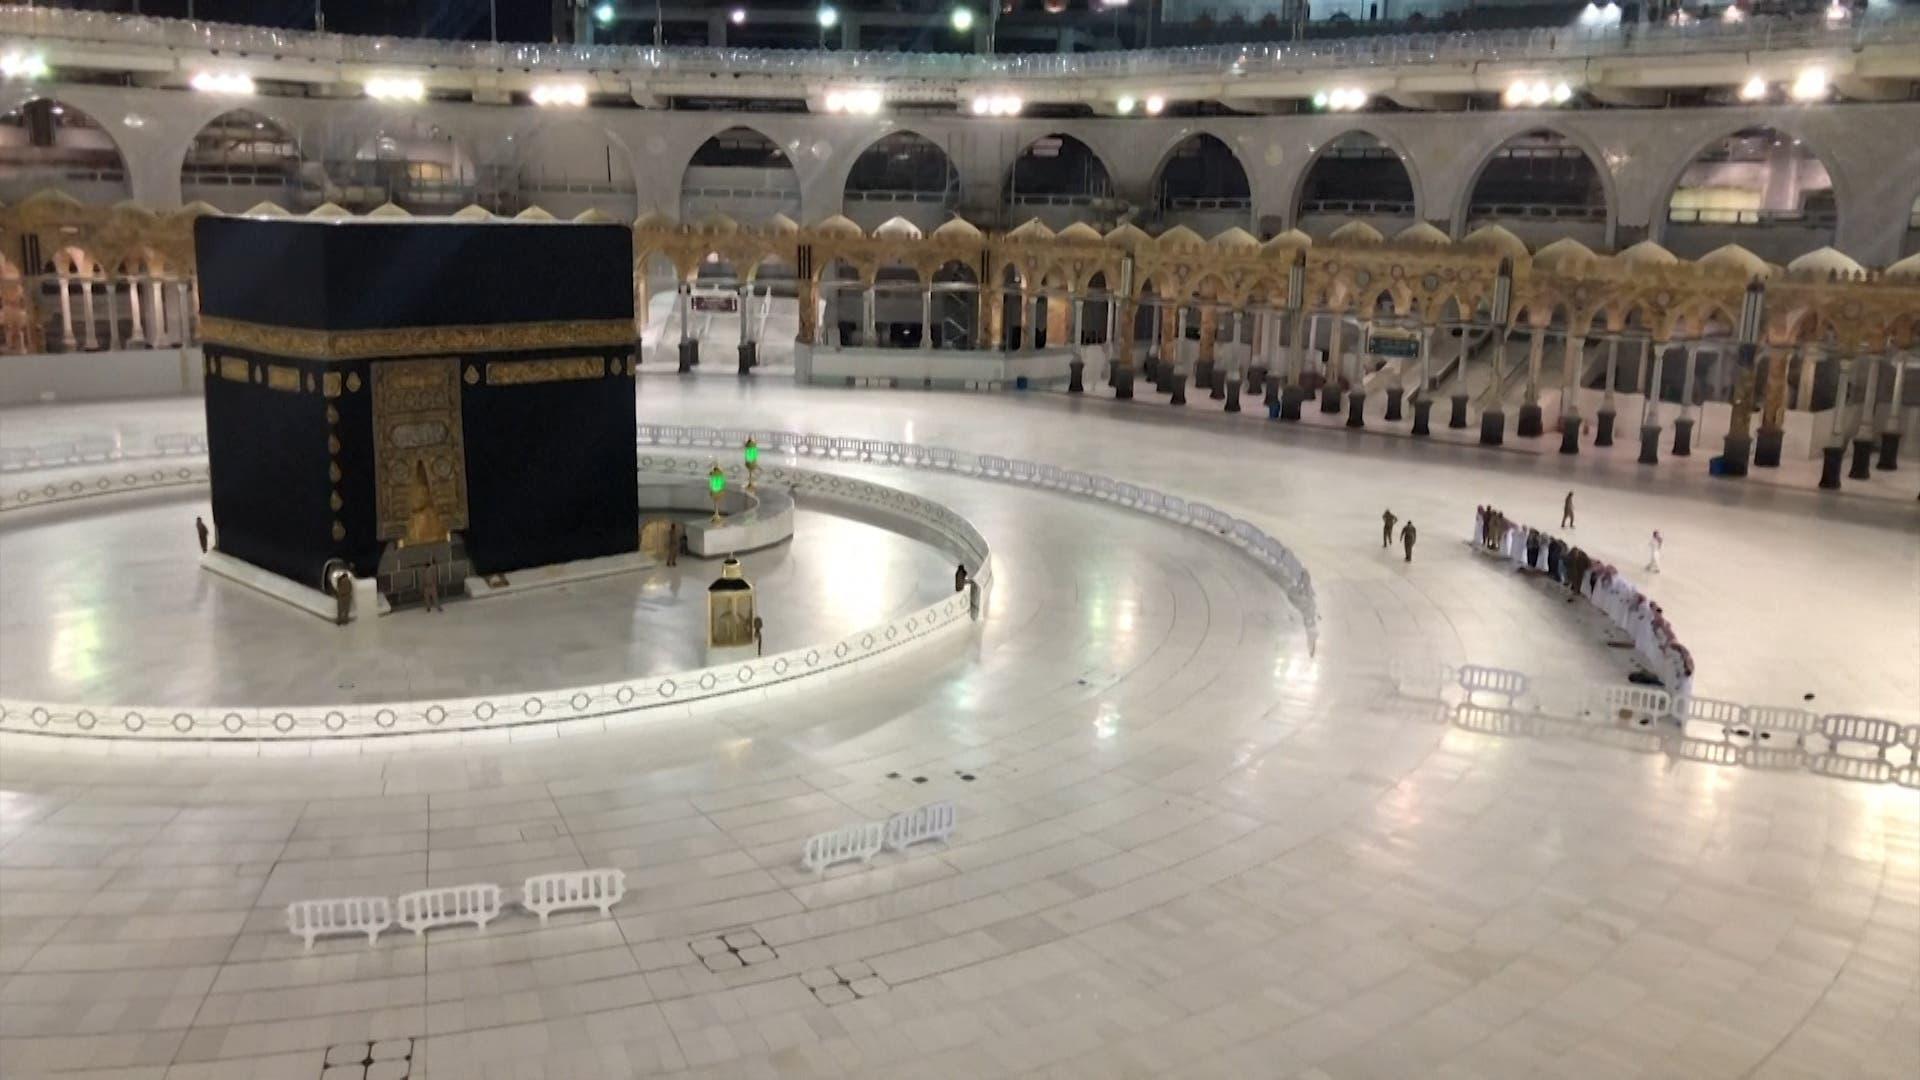 Eid prayers were held in Mecca, Saudi Arabia with no worshippers present. (File photo)